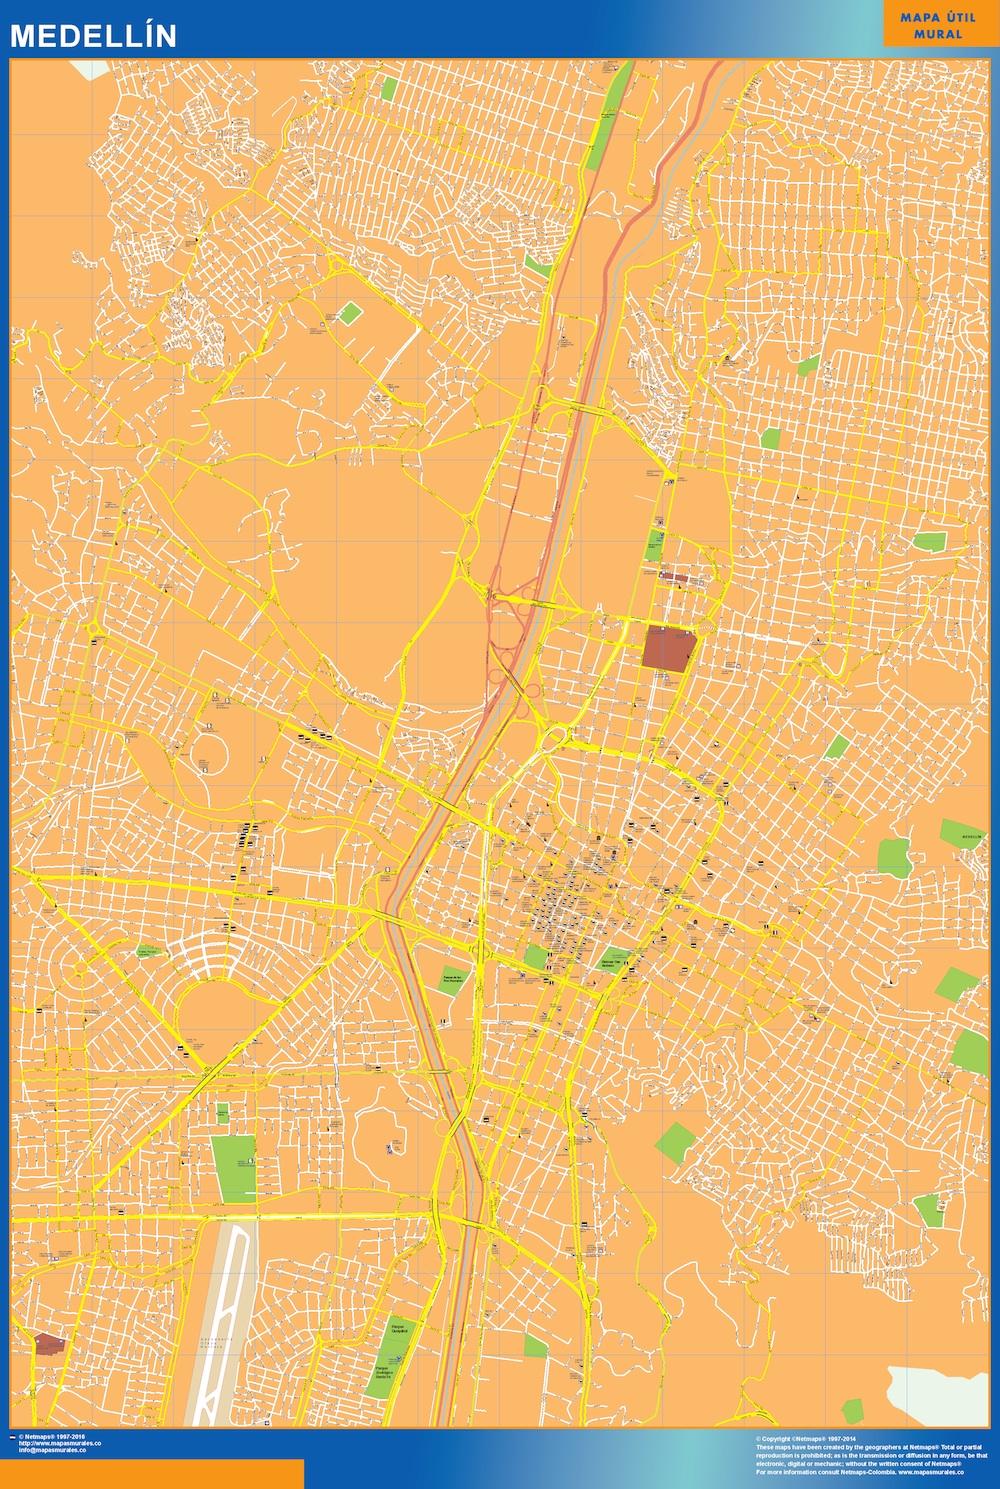 Mapa Medellin